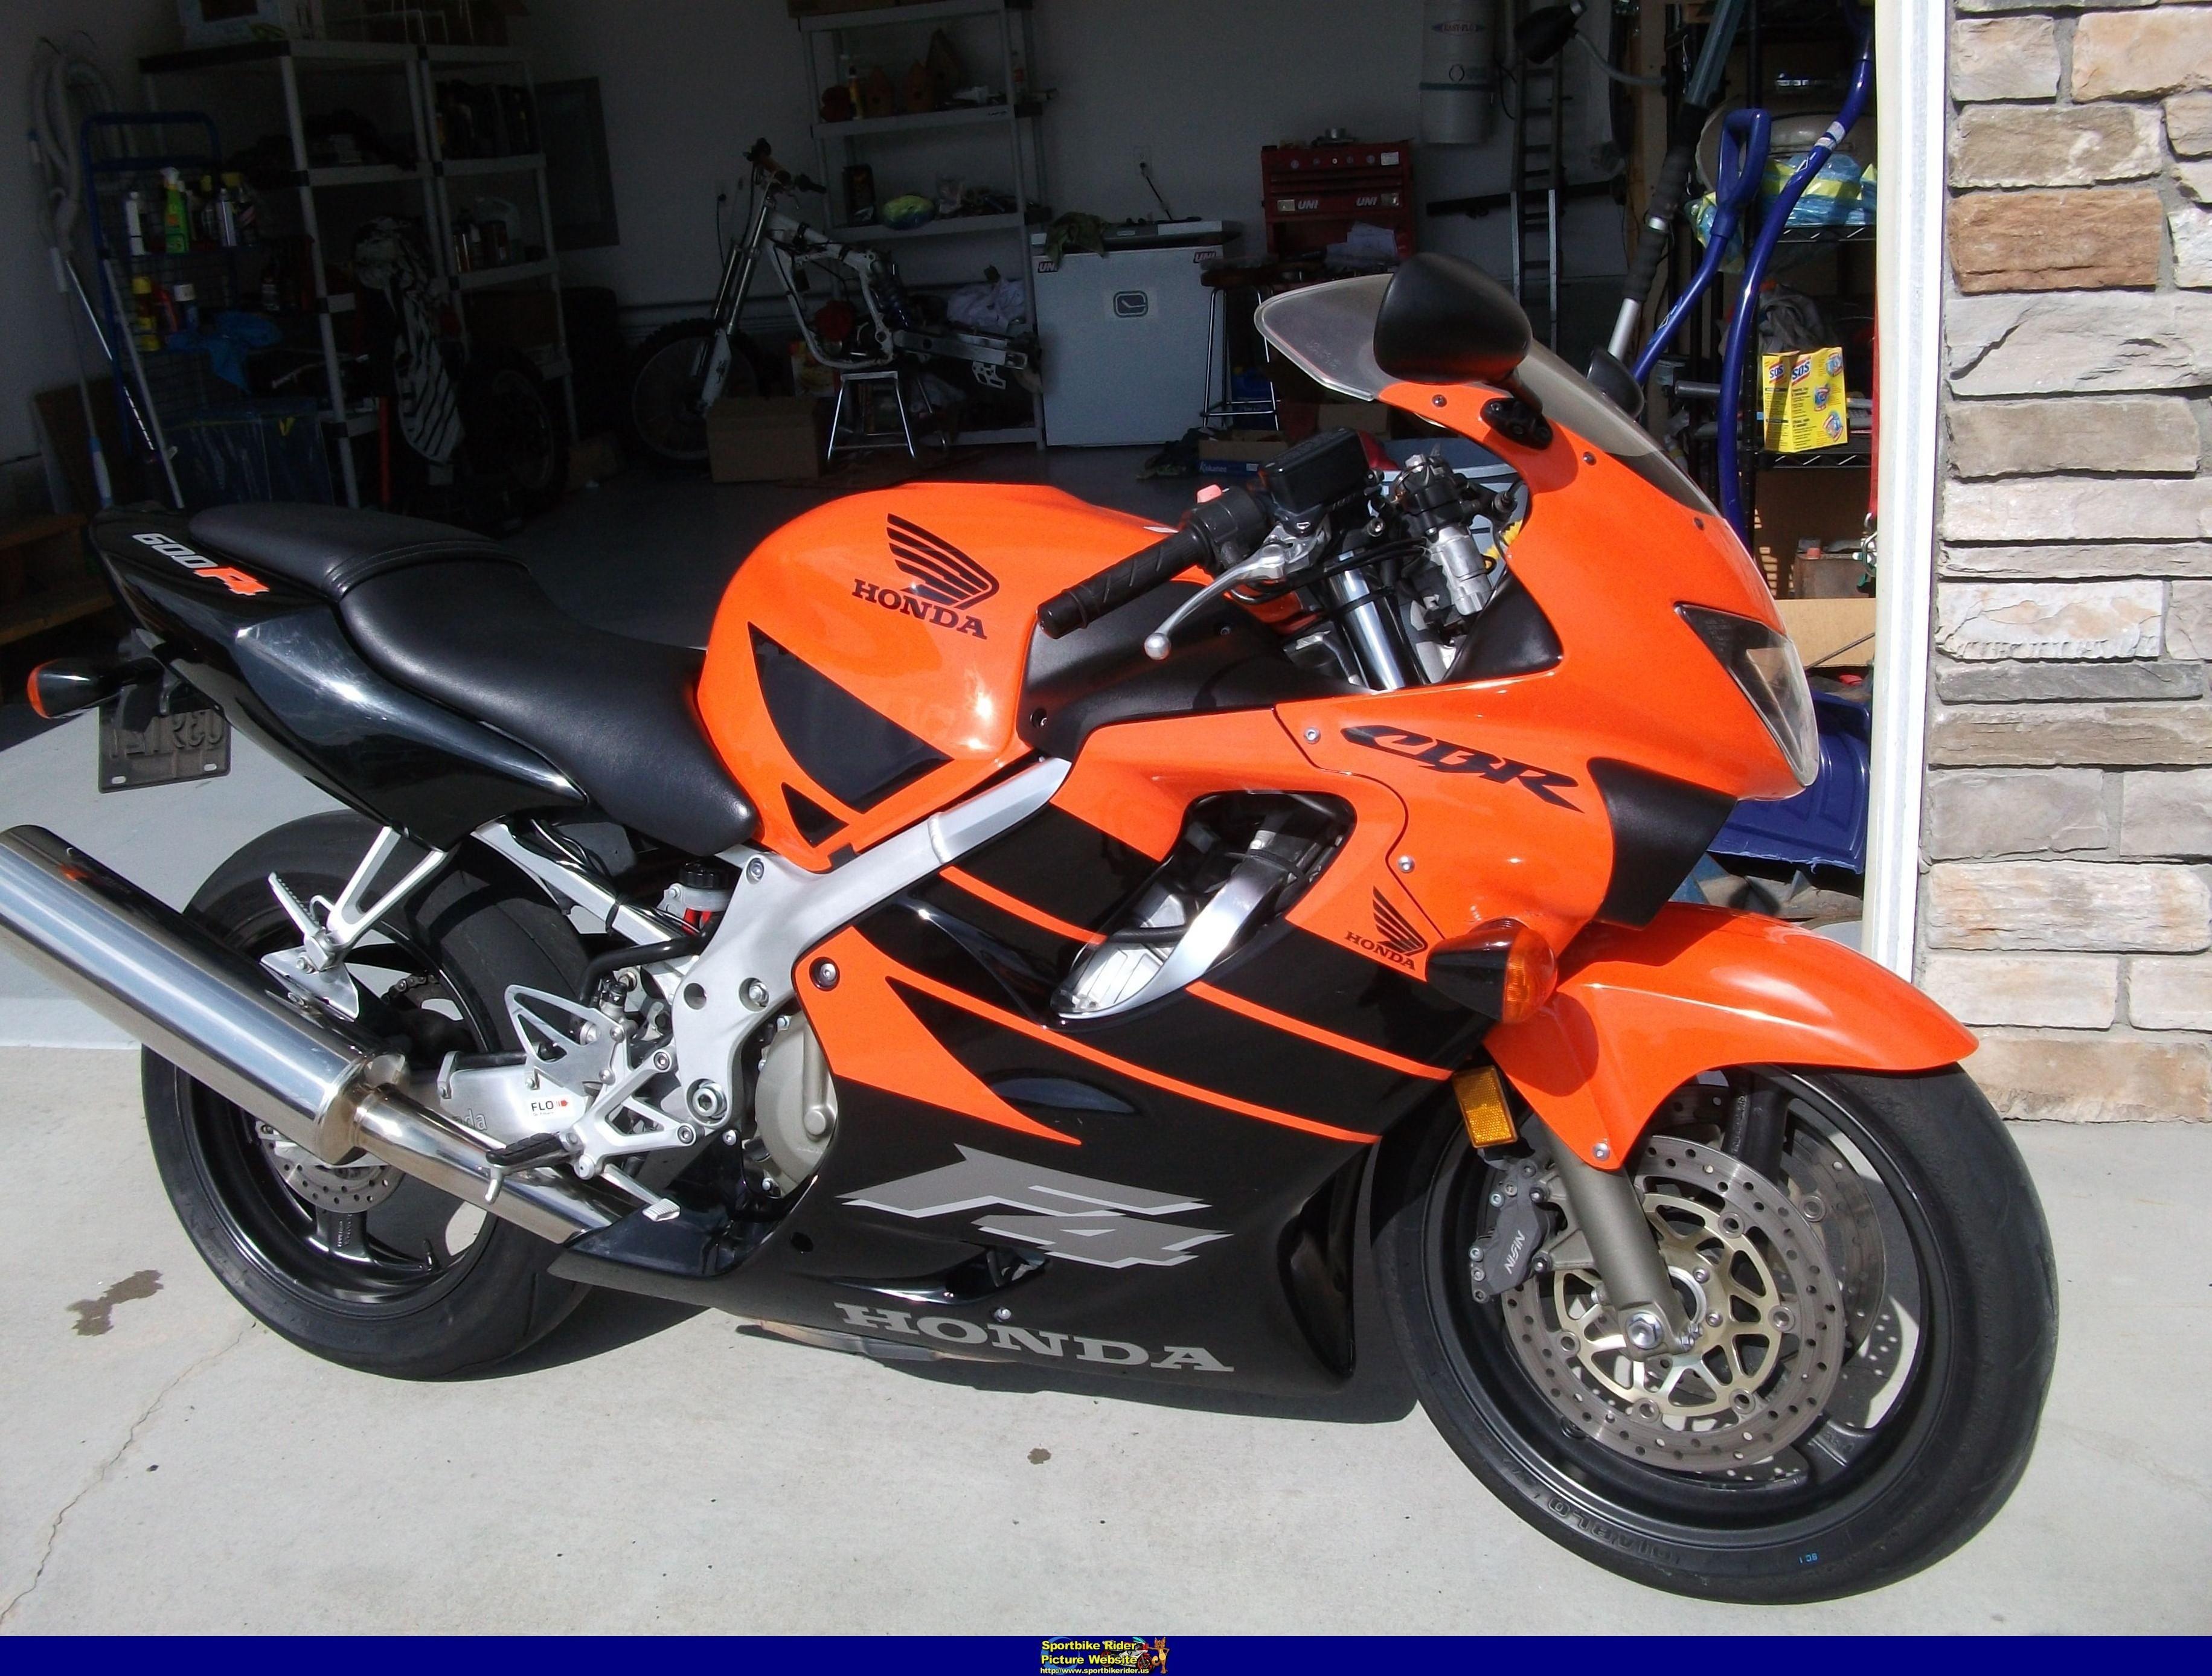 2000 cbr 600 f4 honda sport bikes pinterest honda. Black Bedroom Furniture Sets. Home Design Ideas